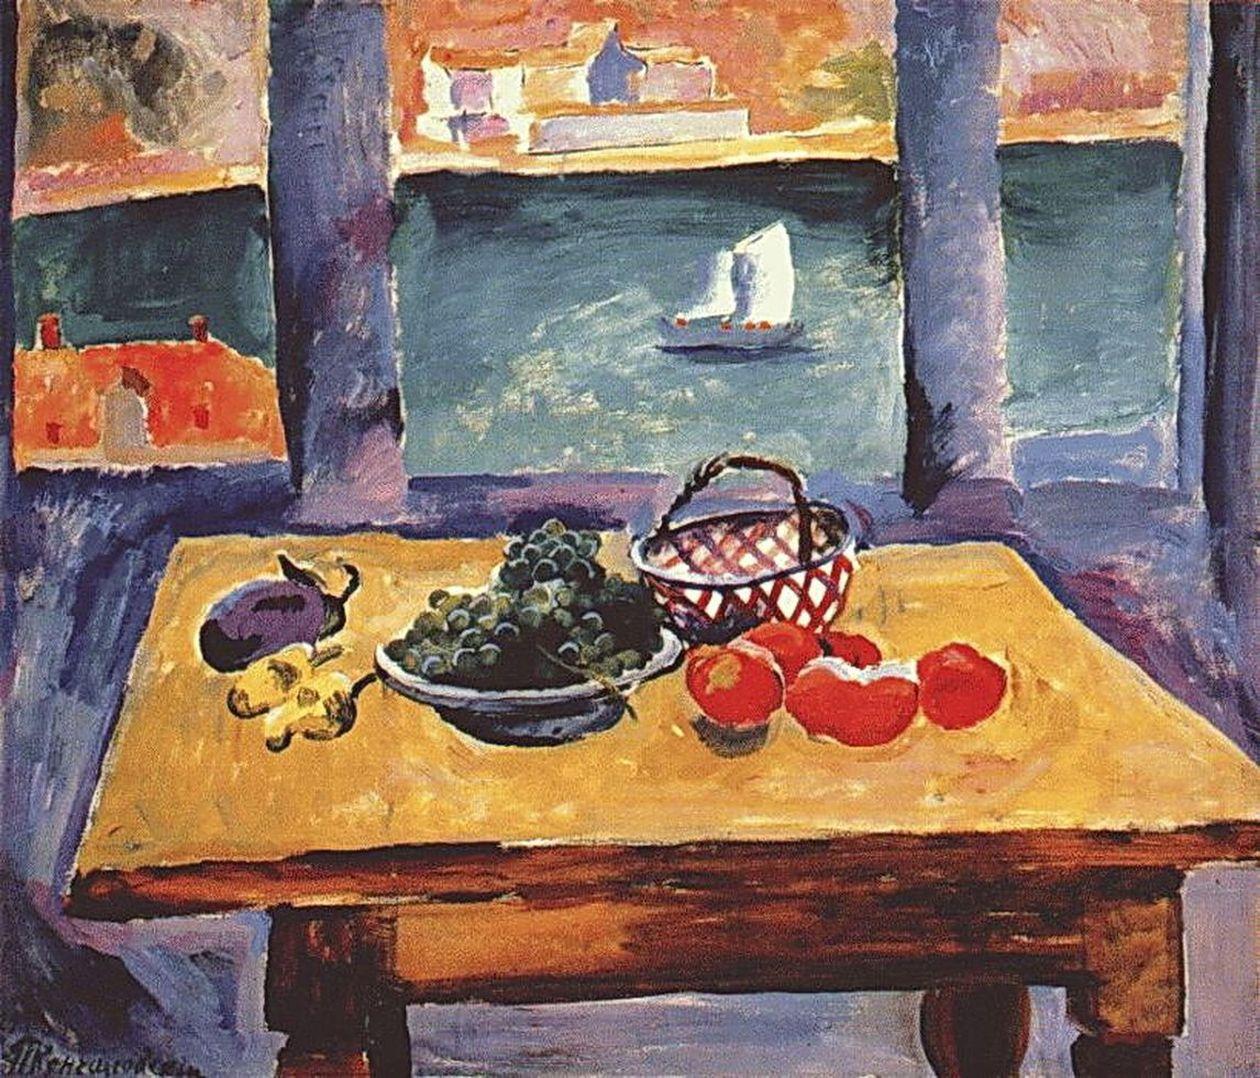 Петр Кончаловский. Балаклава. Окно. (Виноград на столе). 1929